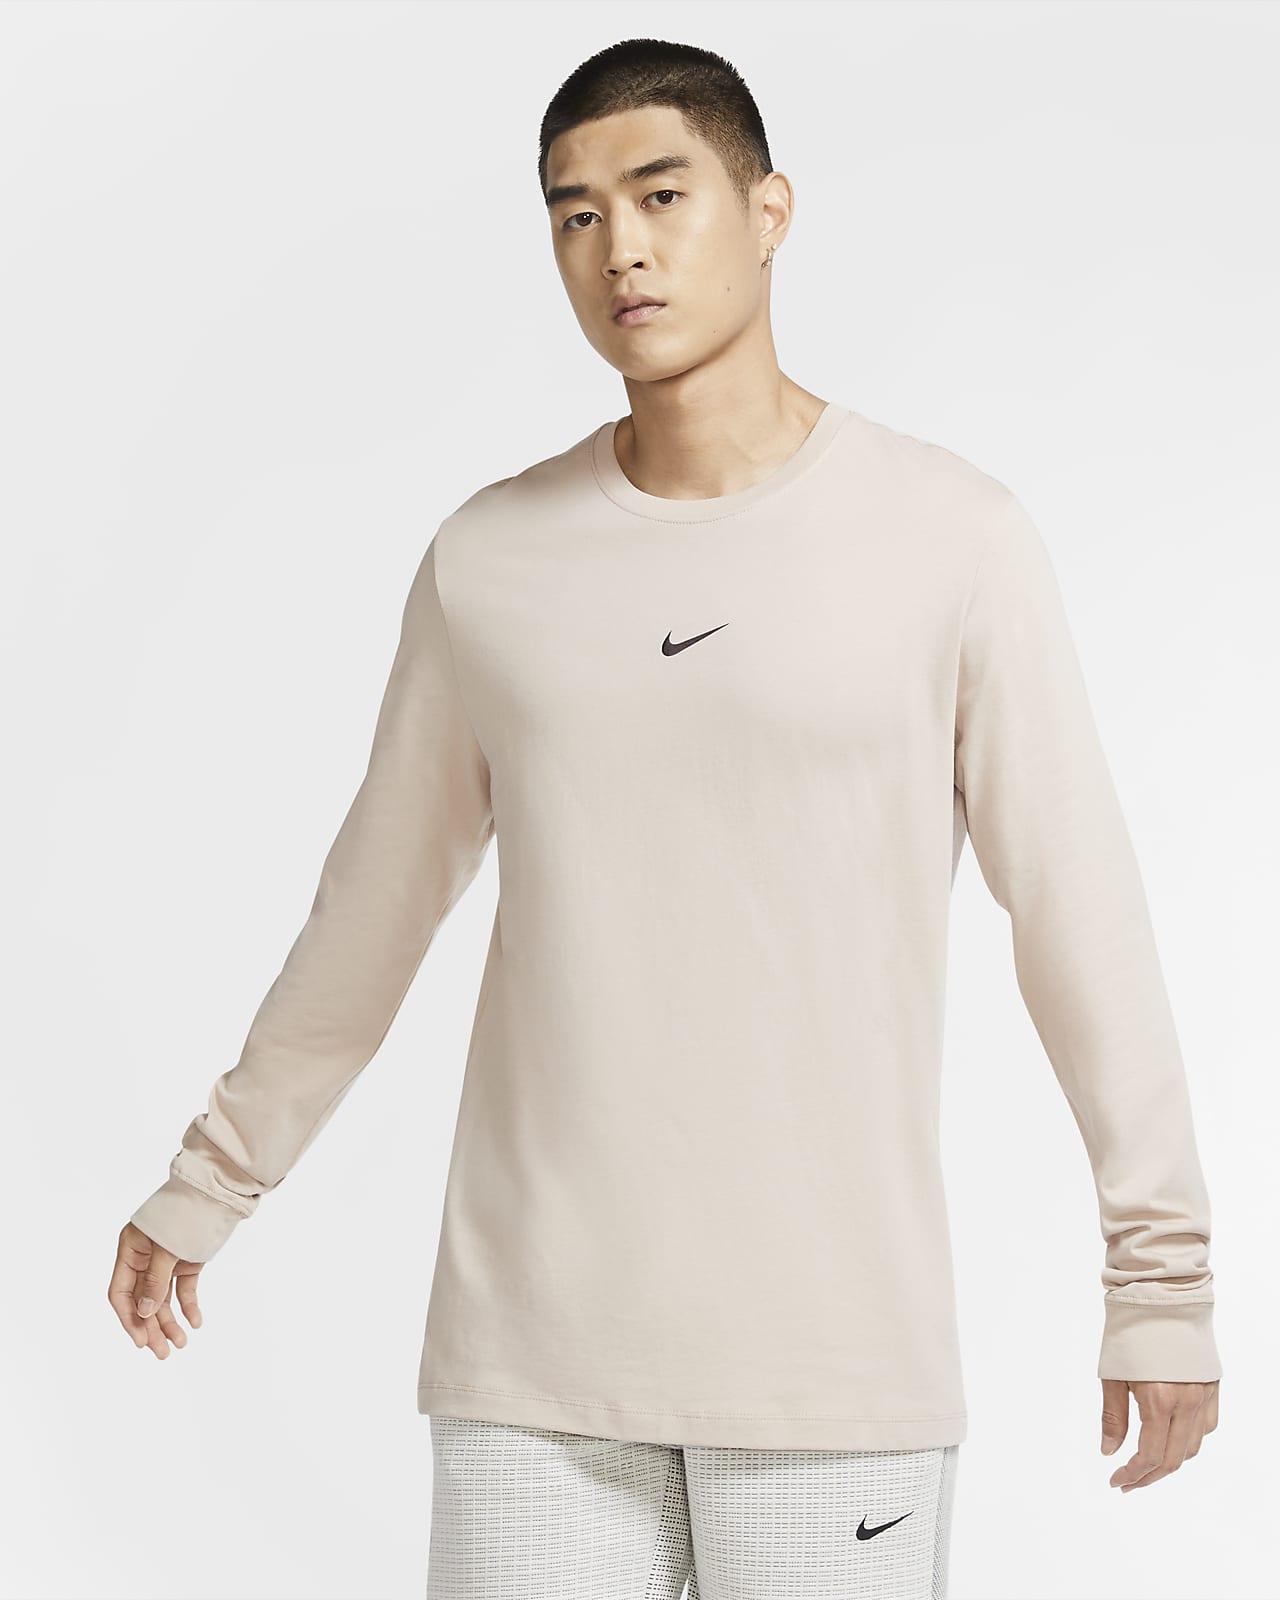 Tee-shirt à manches longues Nike Sportswear Swoosh pour Homme